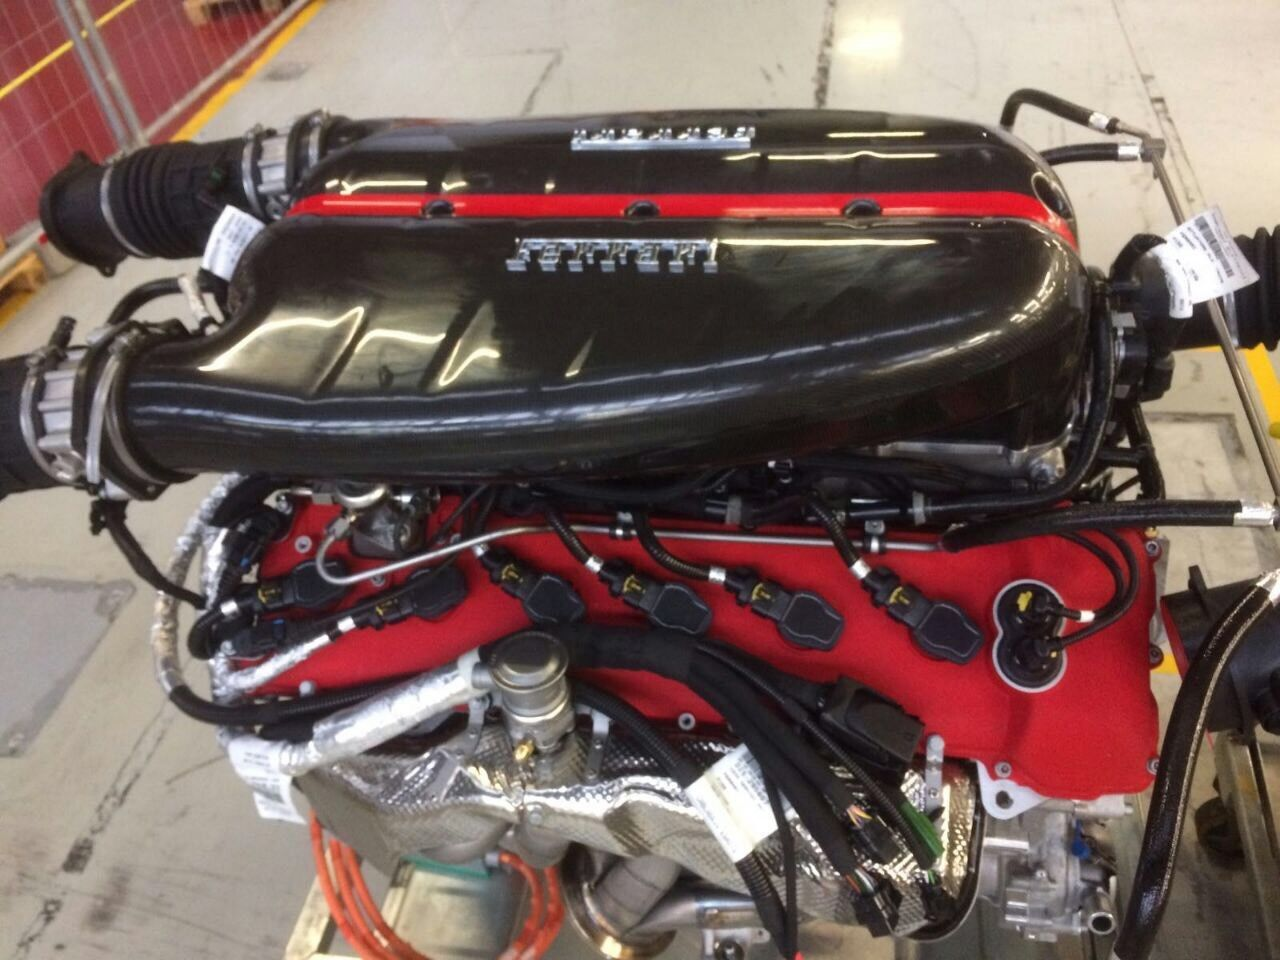 Photo of Πόσο μπορεί να κοστίζει ένας κινητήρας από μια LaFerrari;